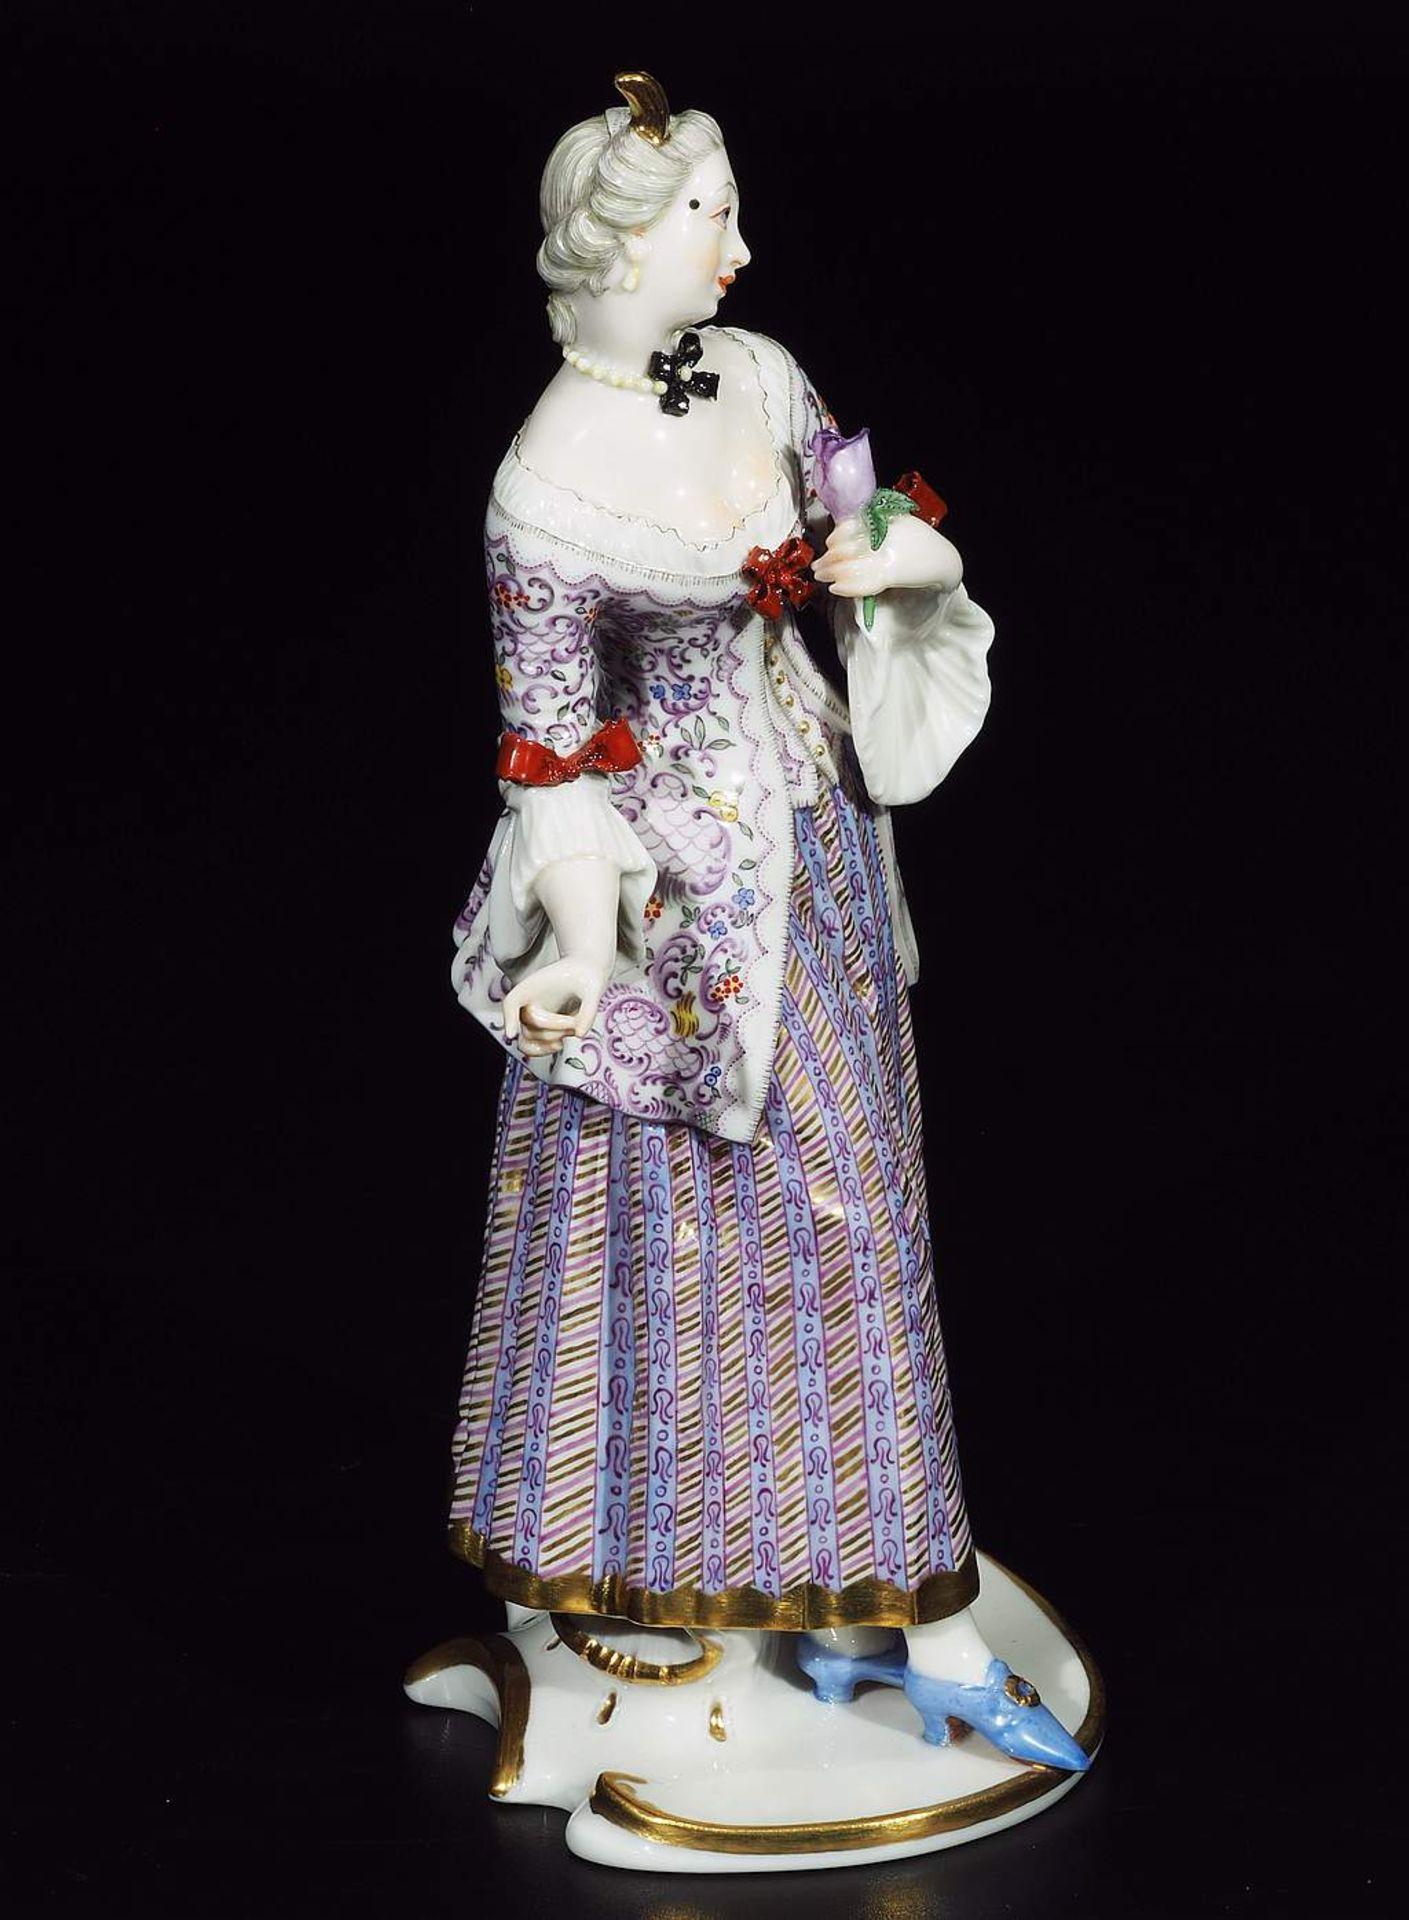 LUCINDA, Figurine der Commedia dell'Arte, NYMPHENBURG, Jahrhundert. - Image 6 of 8